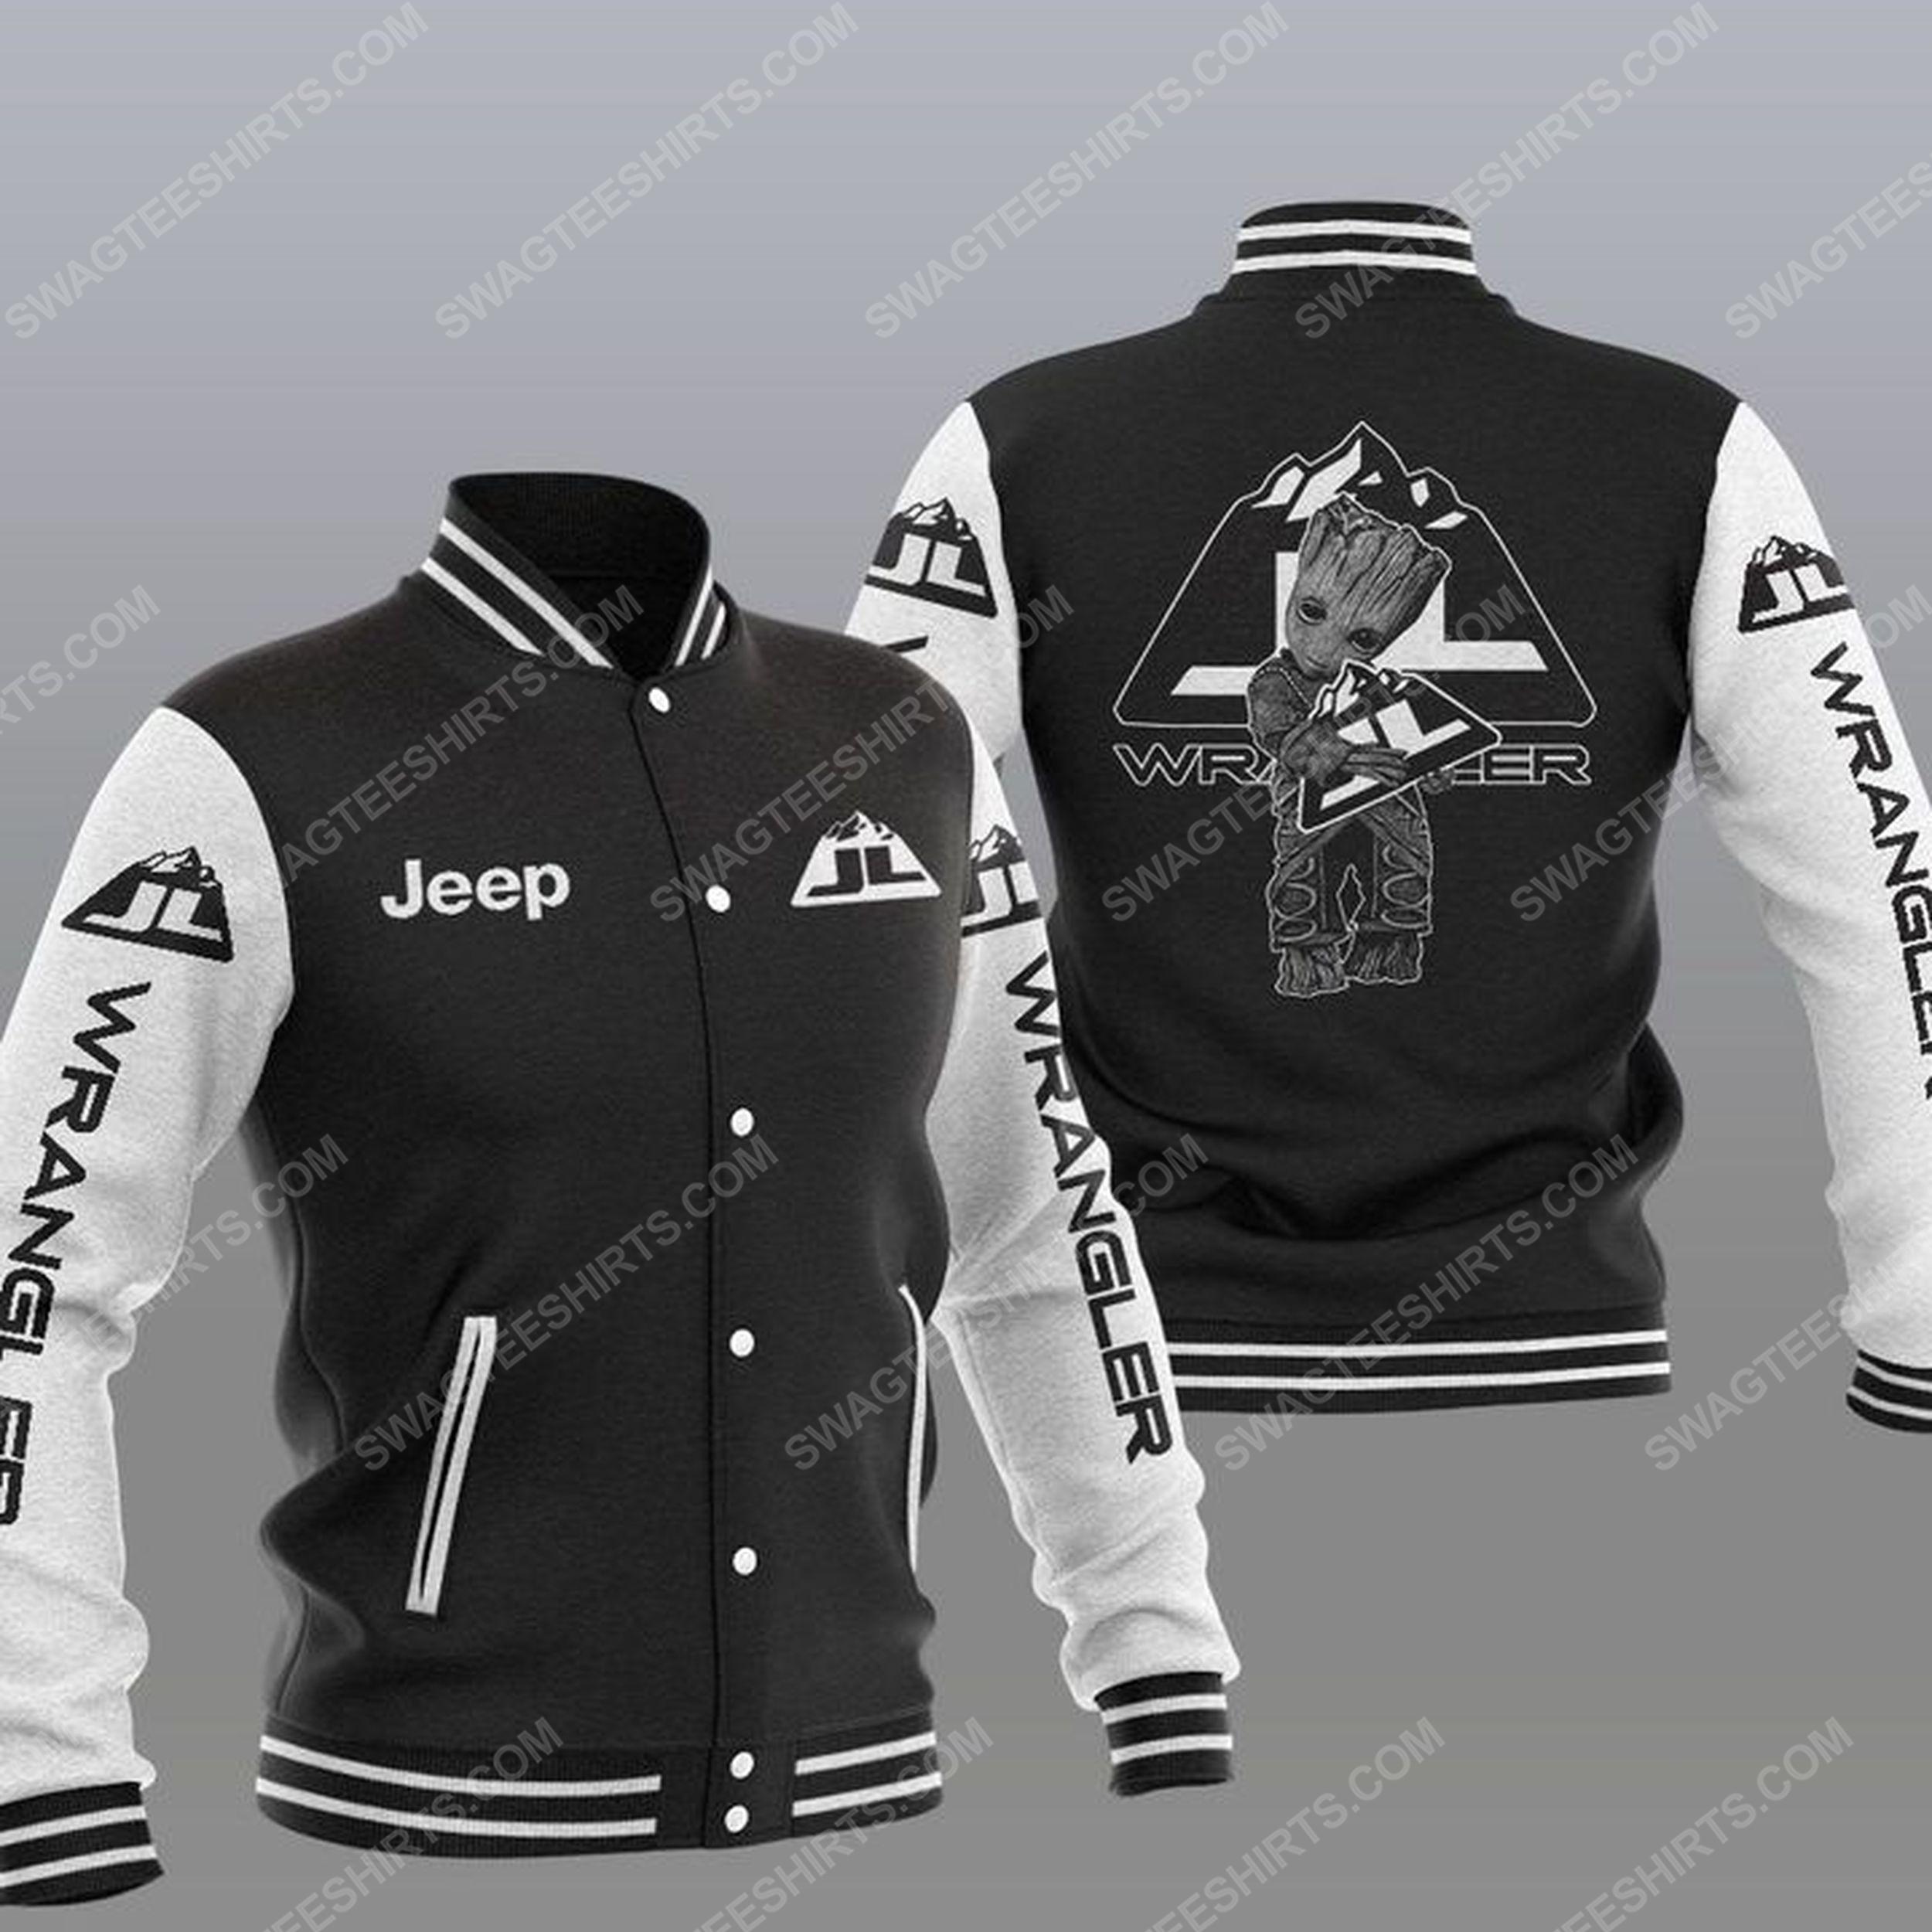 Baby groot and jeep wrangler all over print baseball jacket - black 1